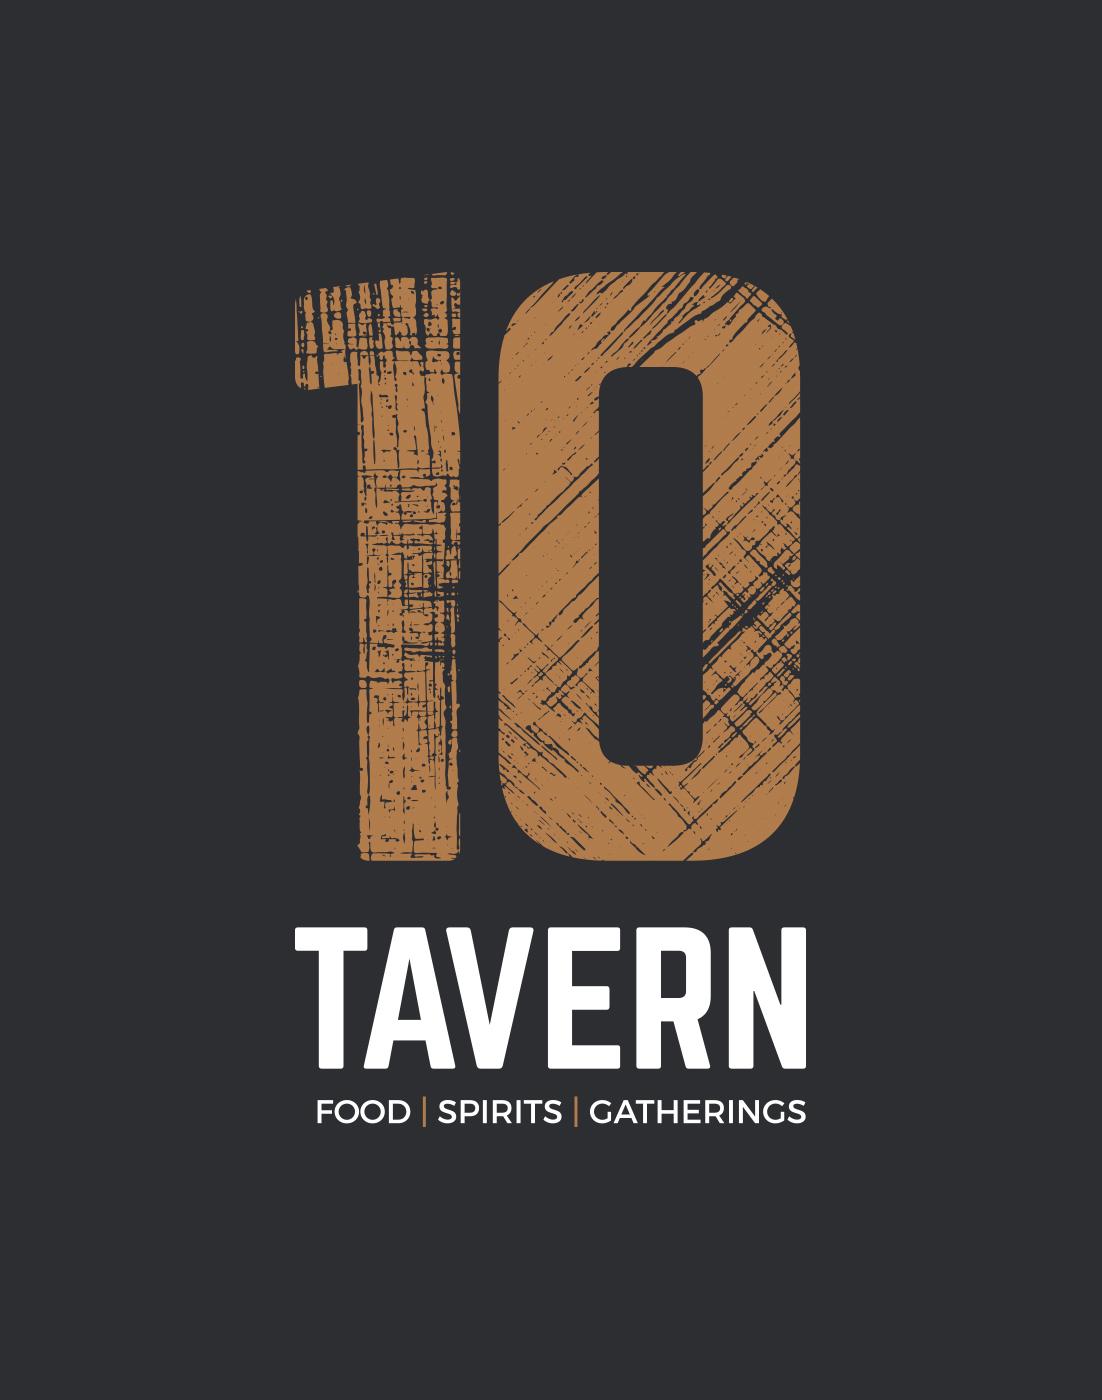 10 Tavern